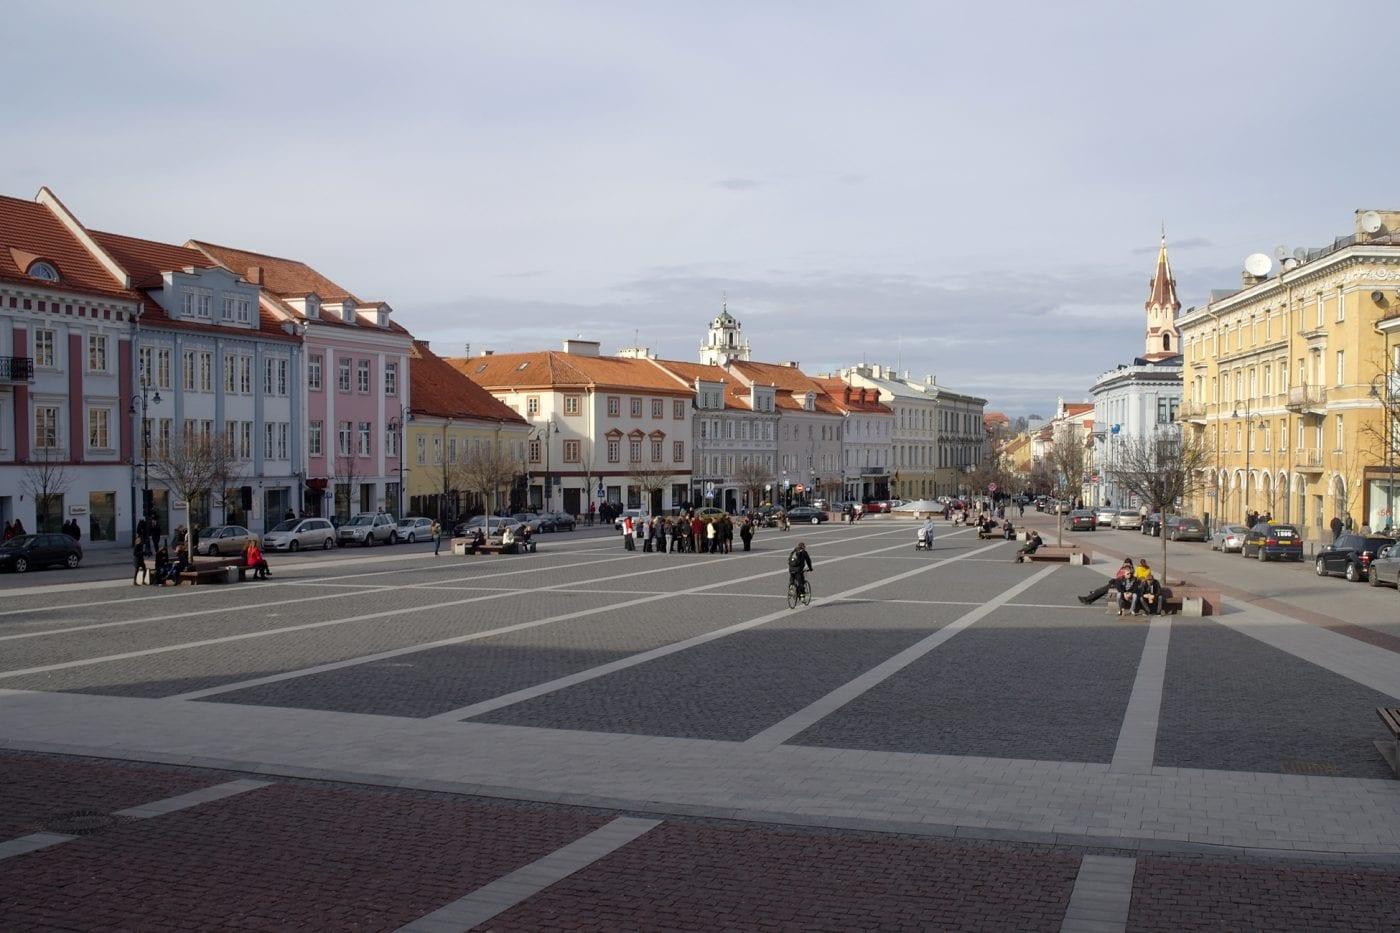 vilnius old town square